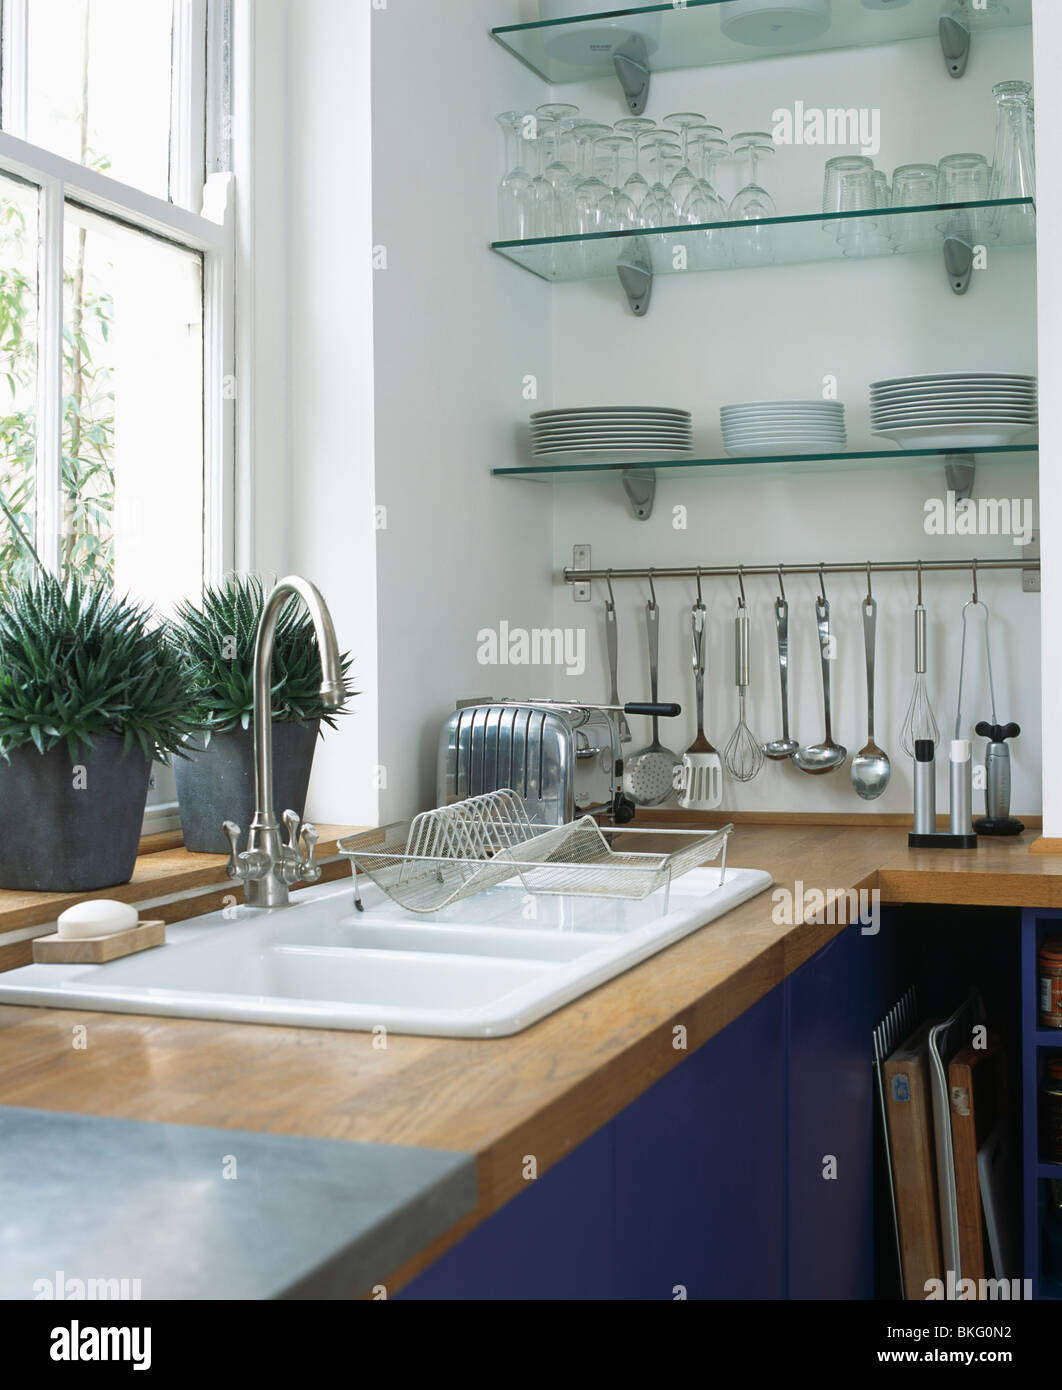 Double White Sink Below Window In Modern Kitchen With